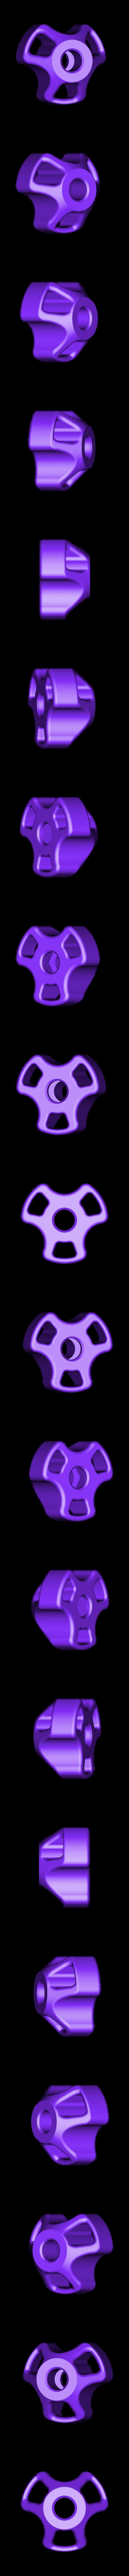 Nut-M8.STL Download free STL file Knob for nuts M8 • 3D printable design, perinski